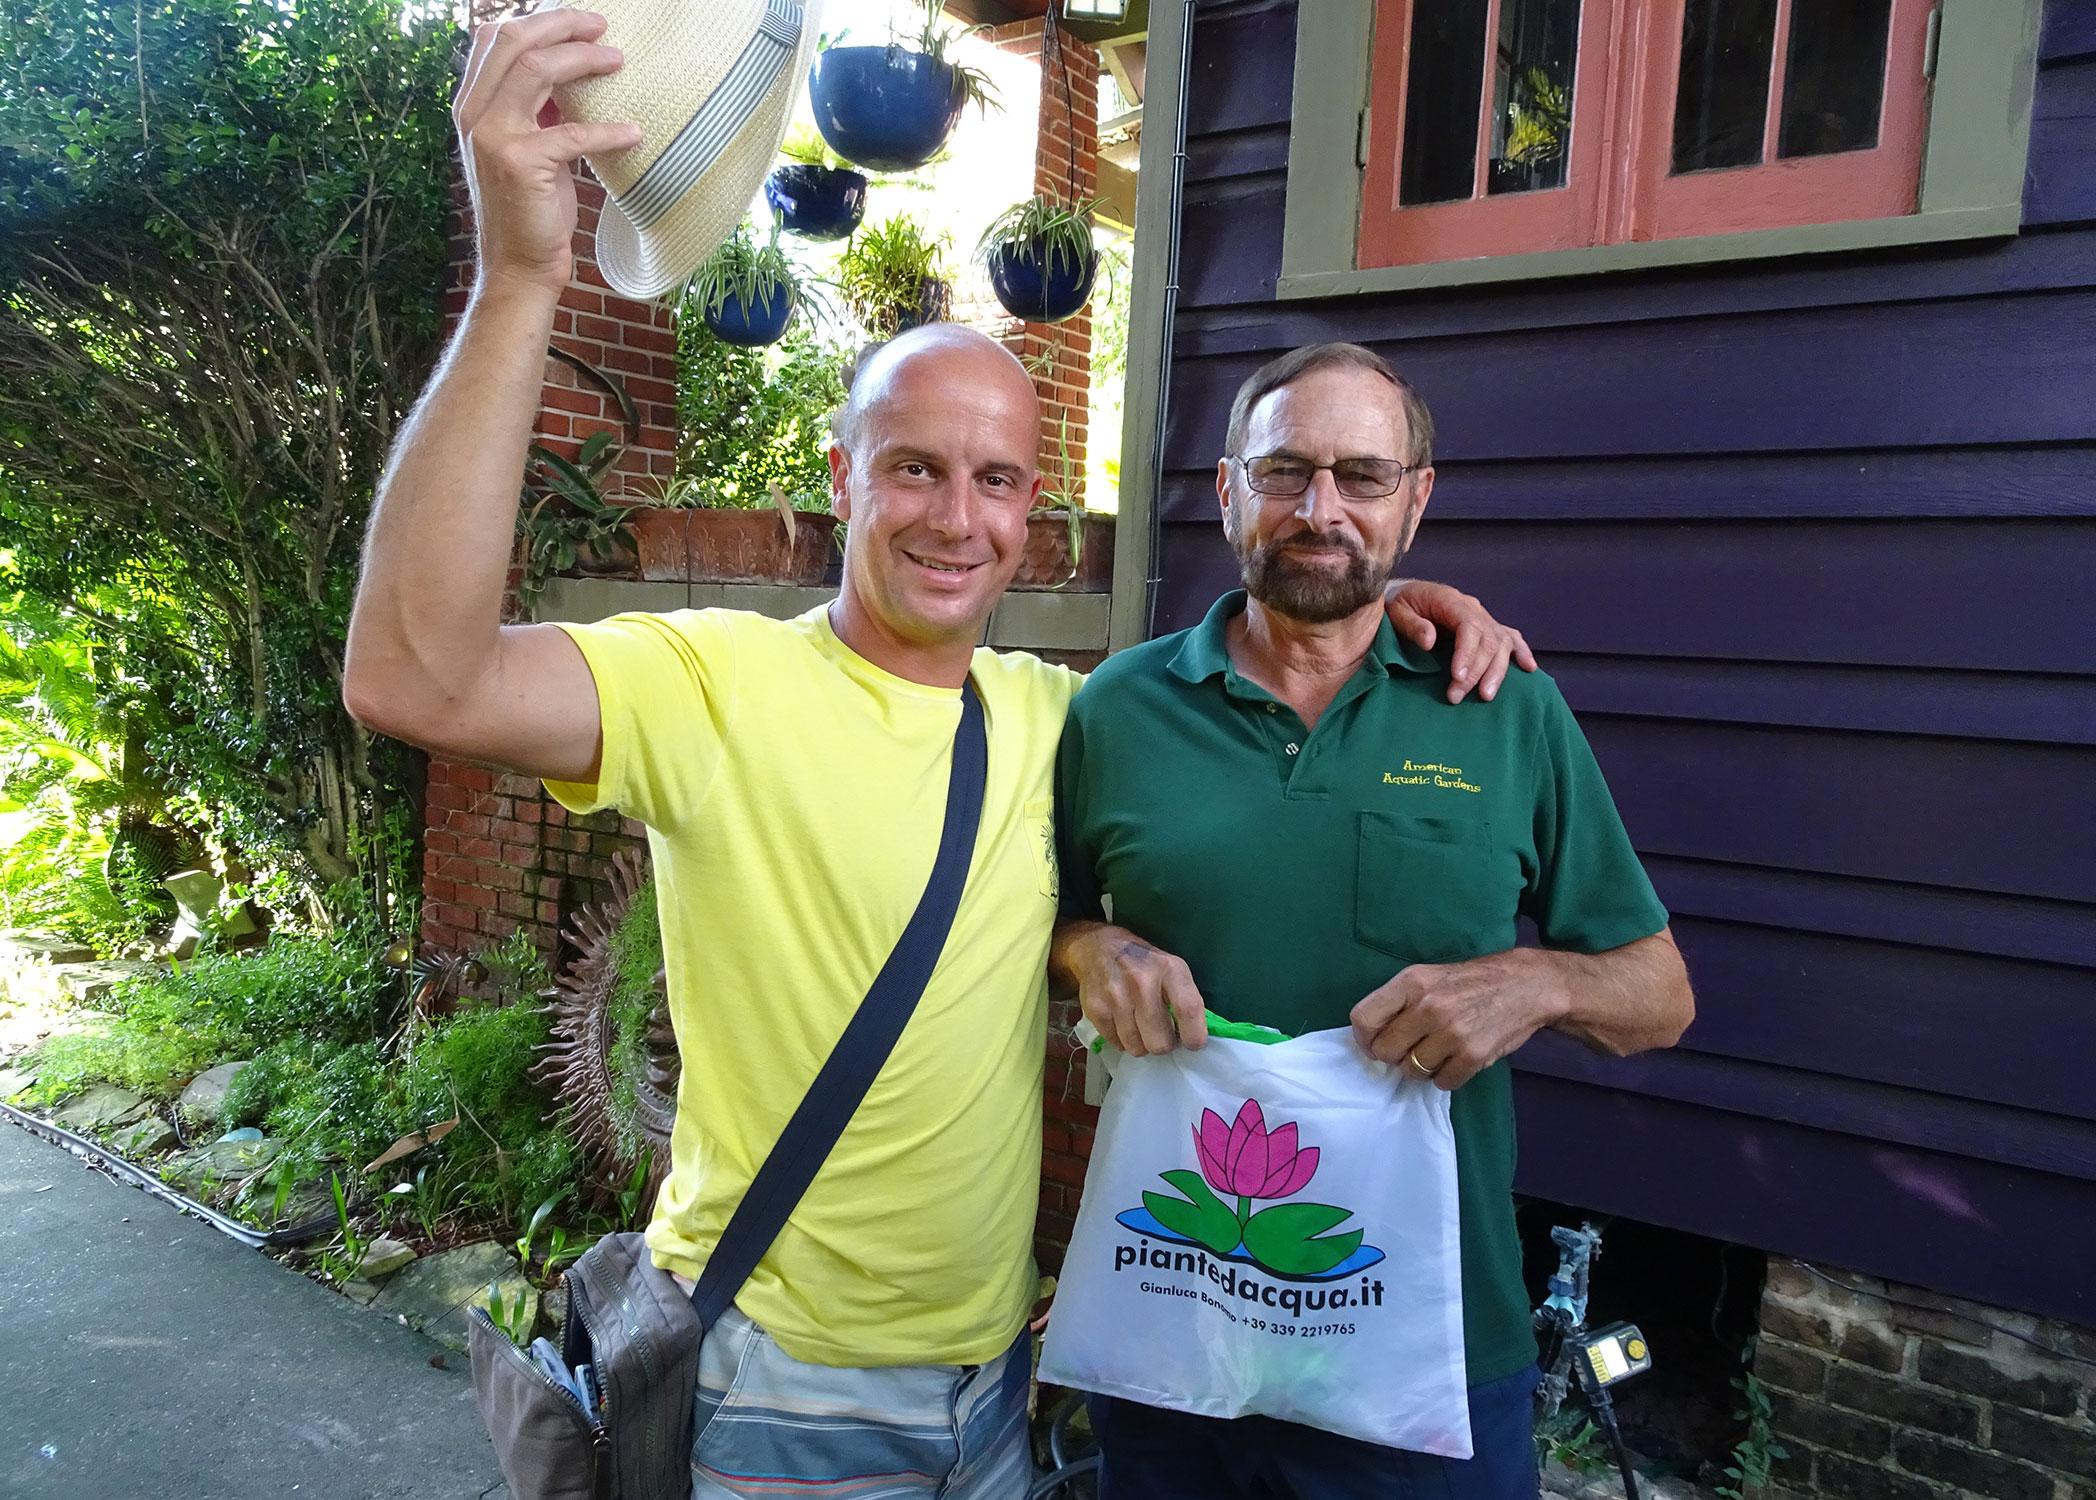 Rich and Gianluca at Casa Grande